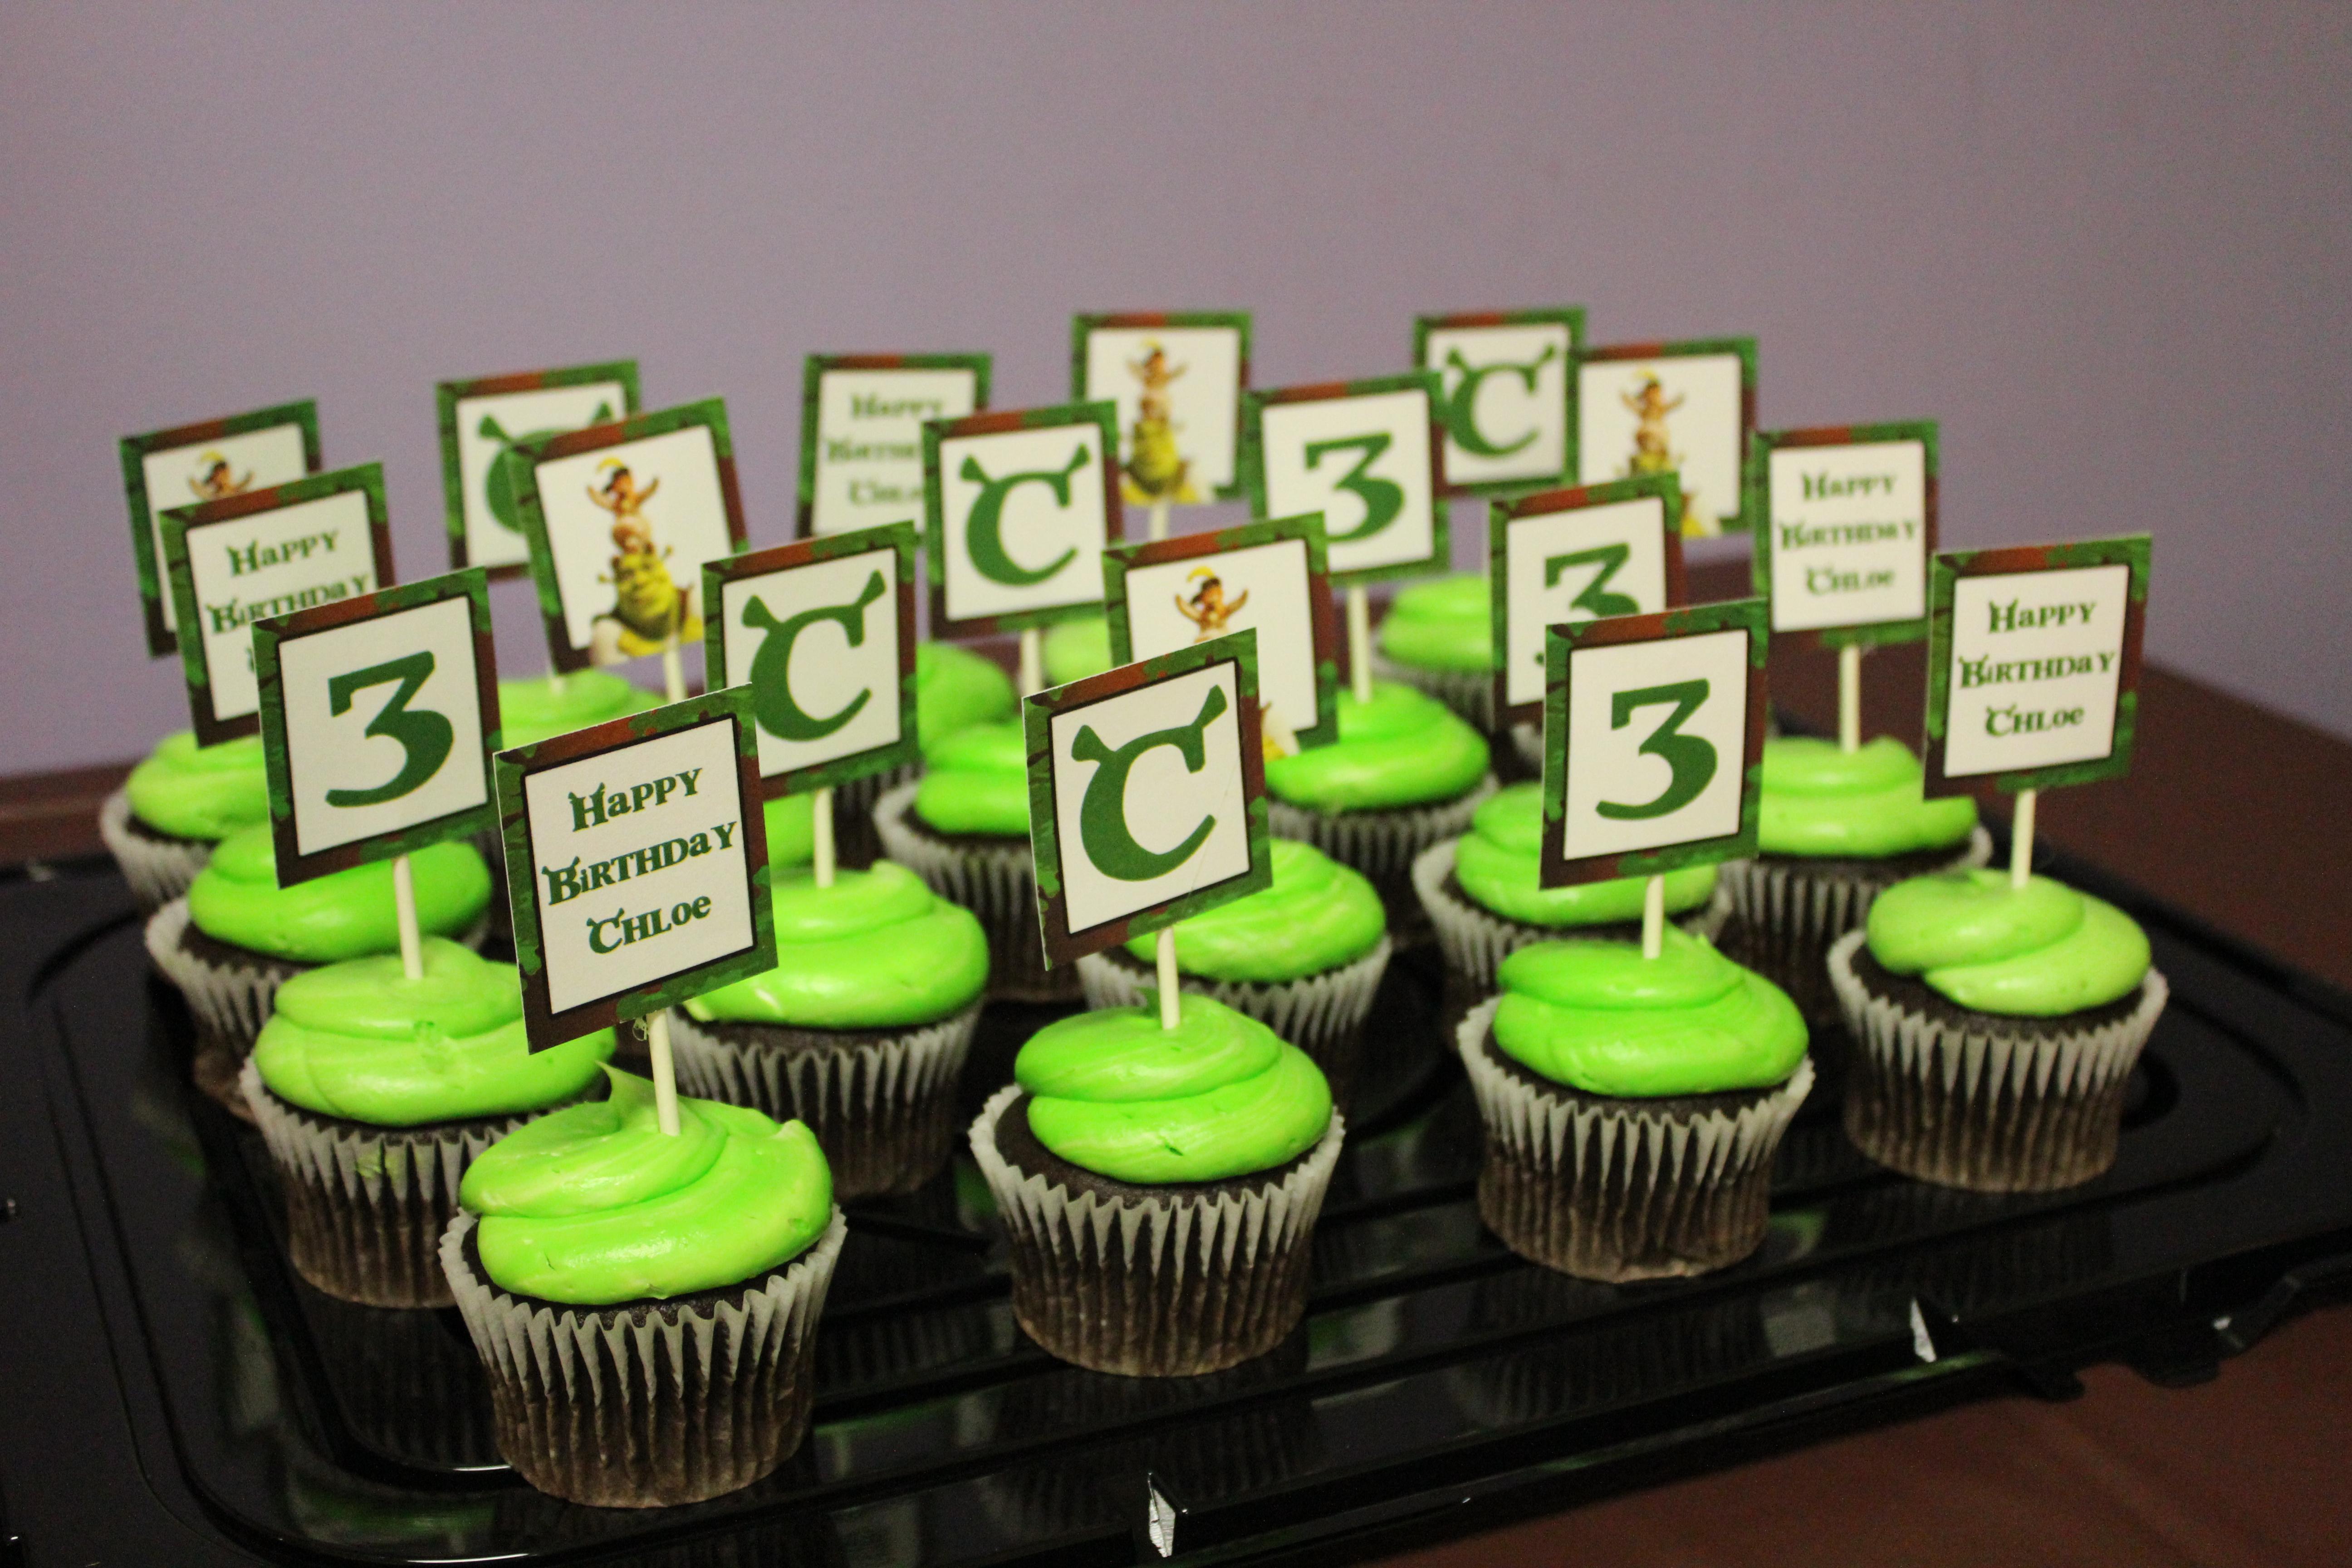 Shrek Birthday Cake And Cupcakes